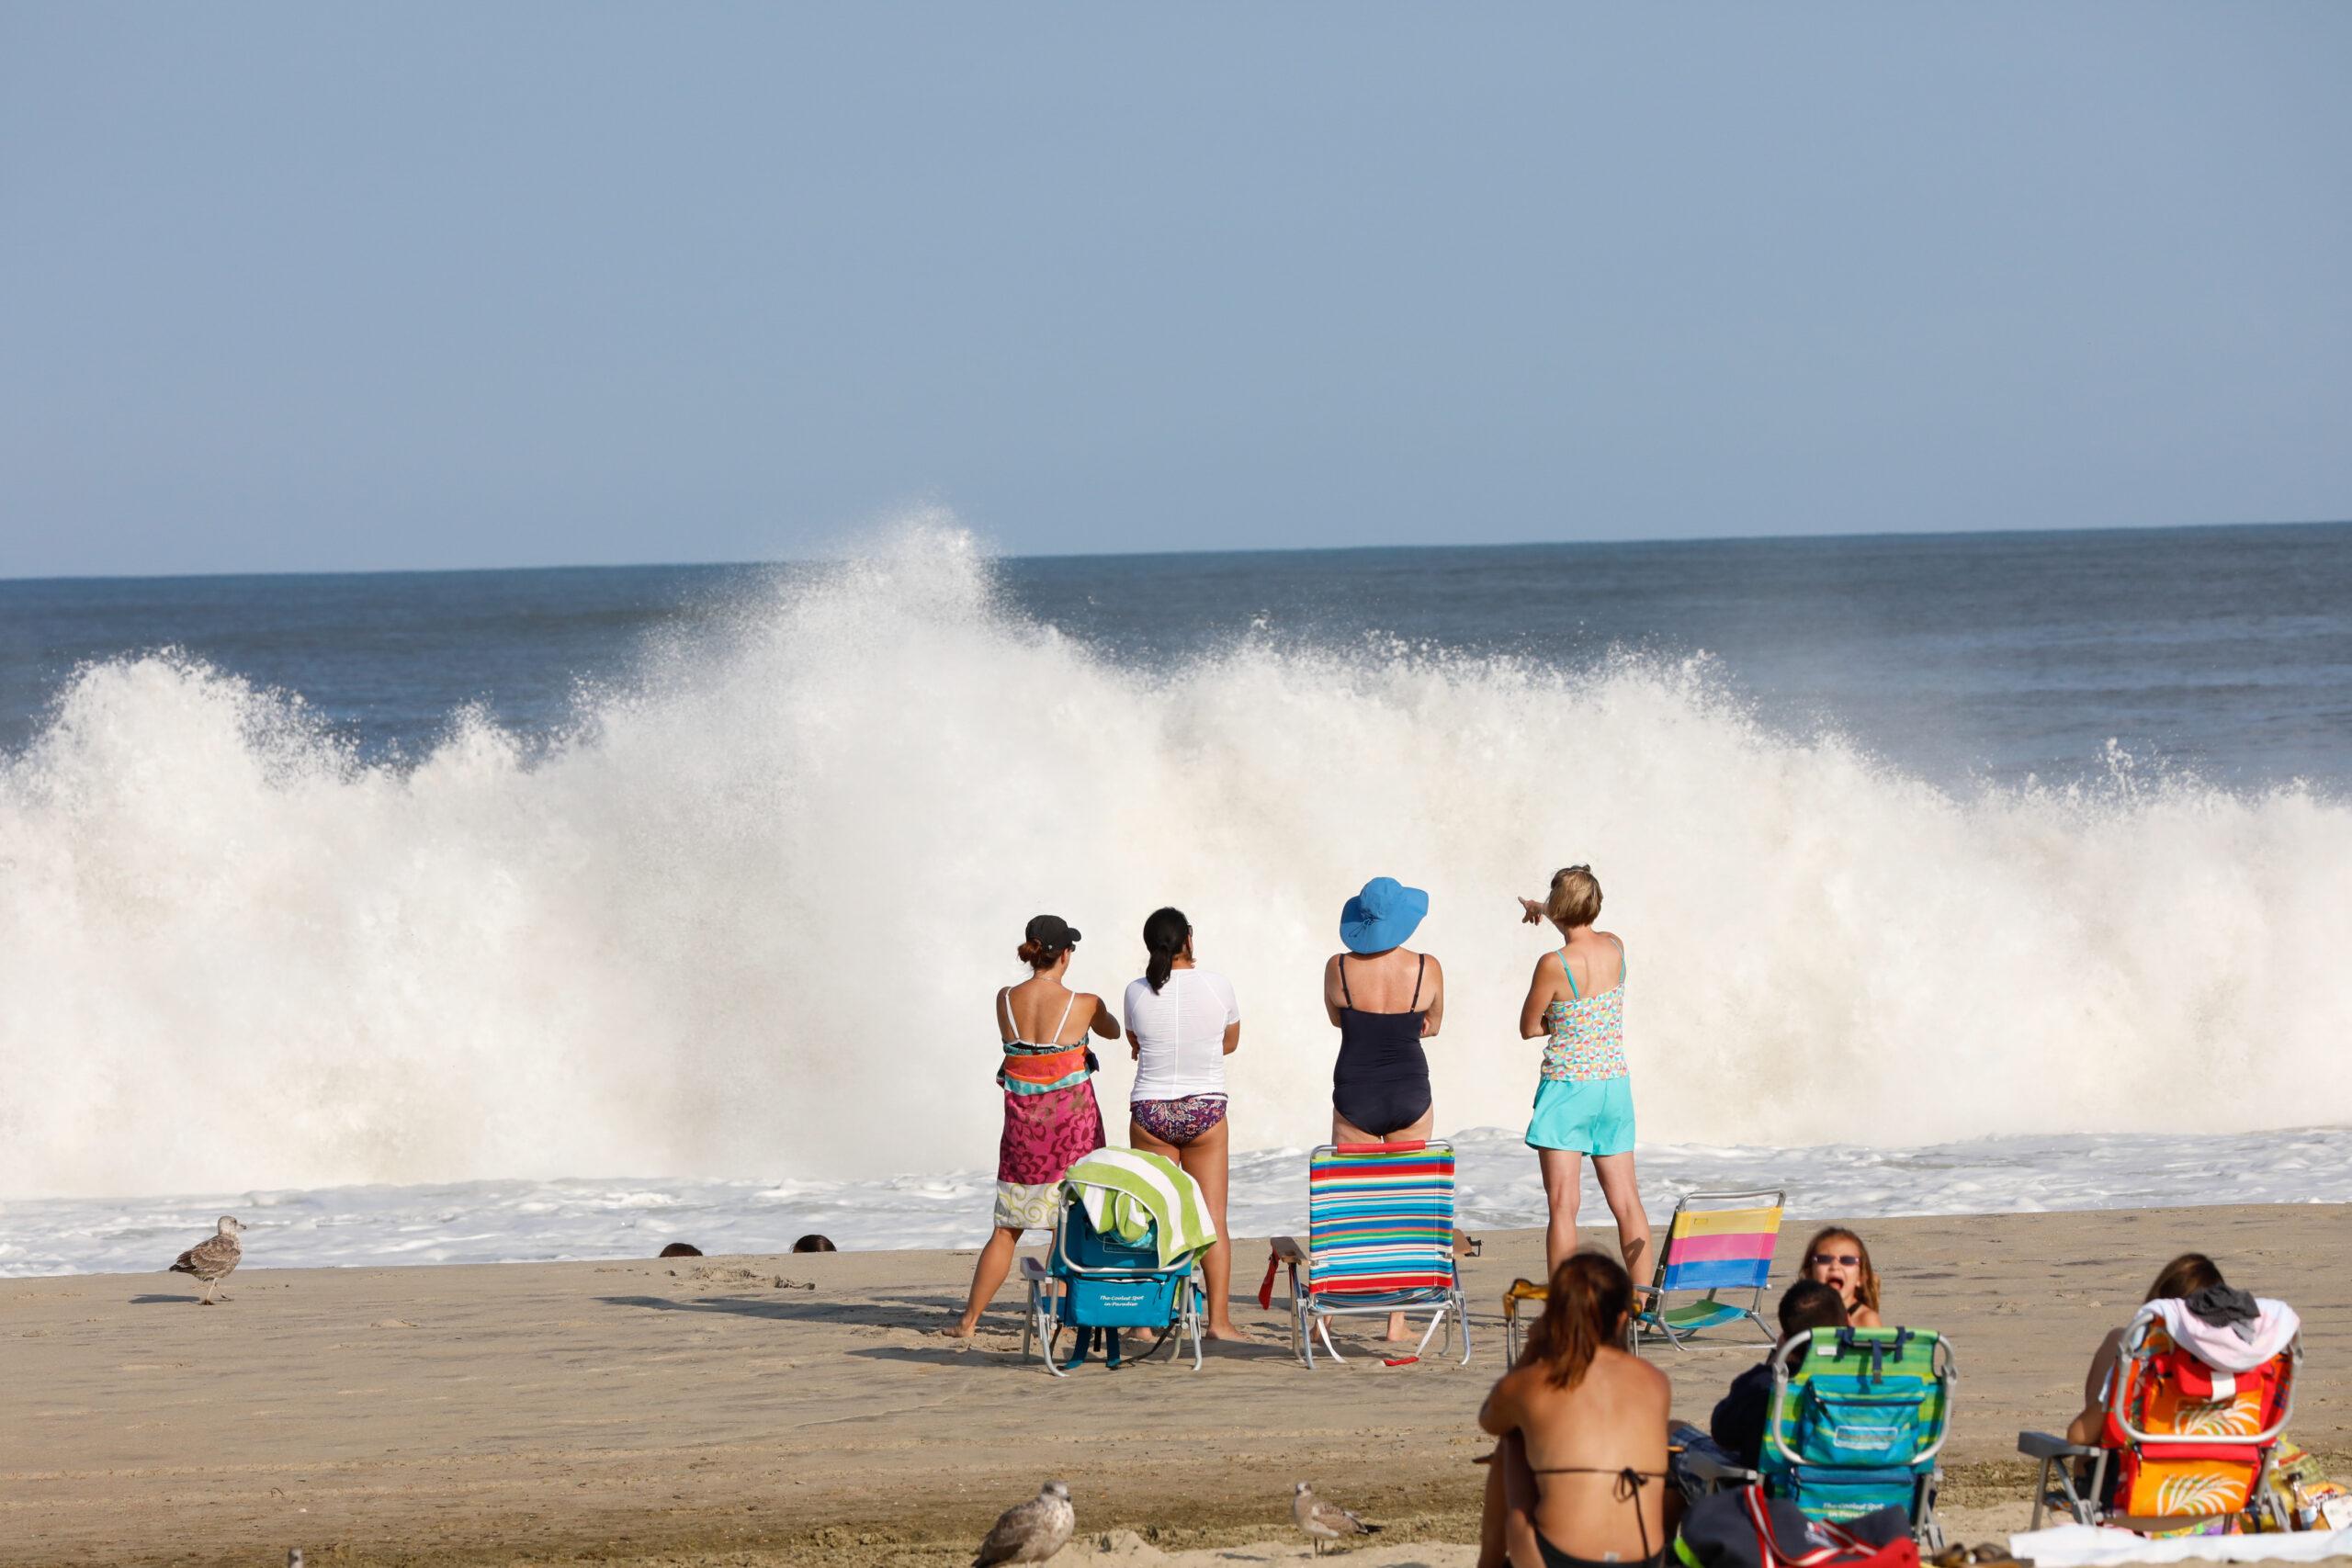 Sea Bright Beach 2020 rules